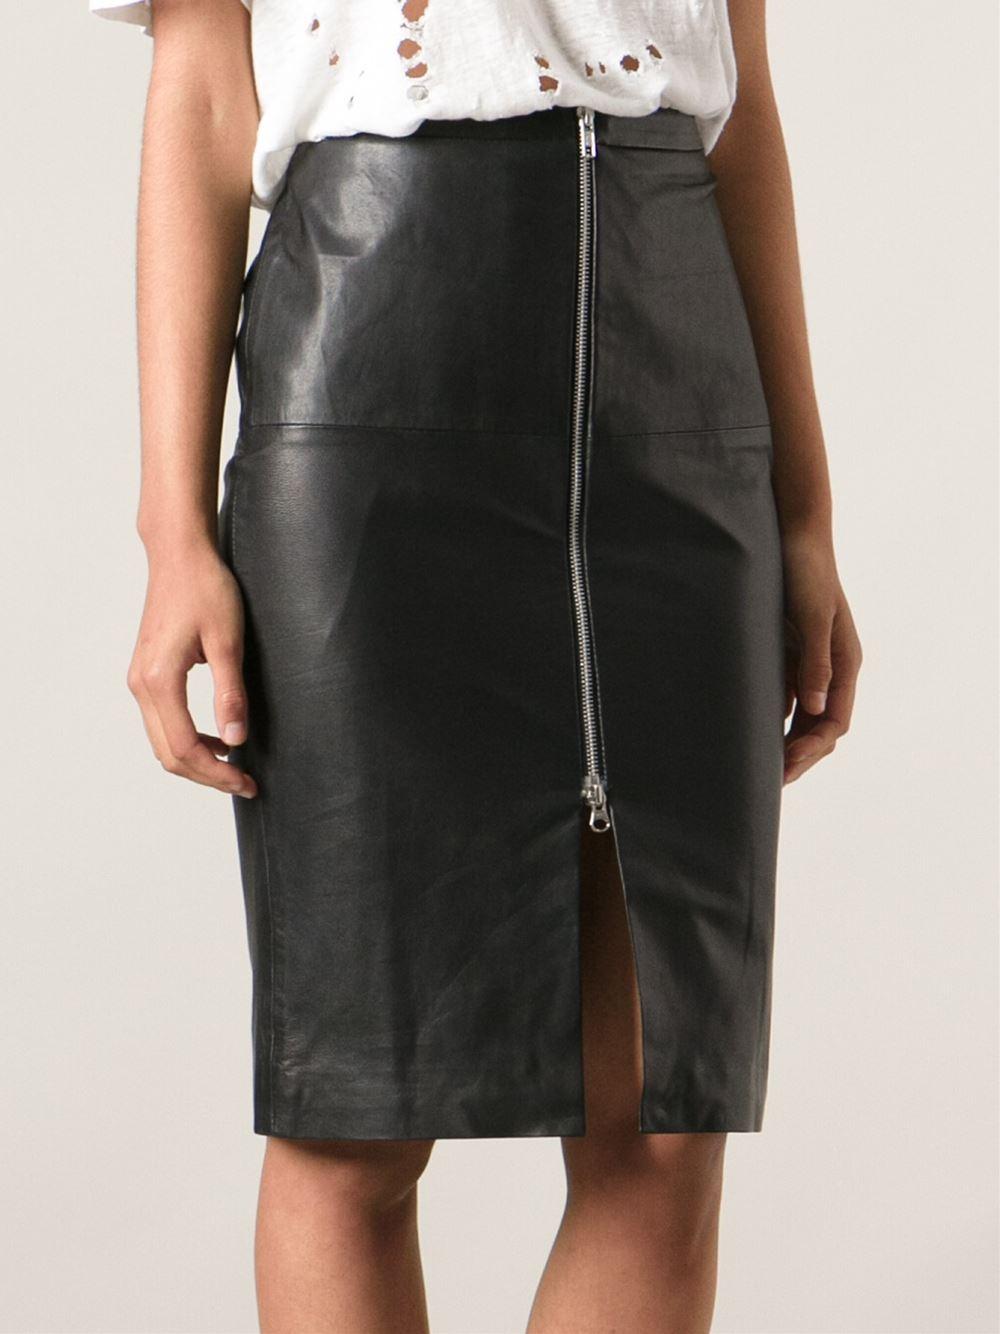 a4eebf145 Muubaa Leather Pencil Skirt in Black - Lyst